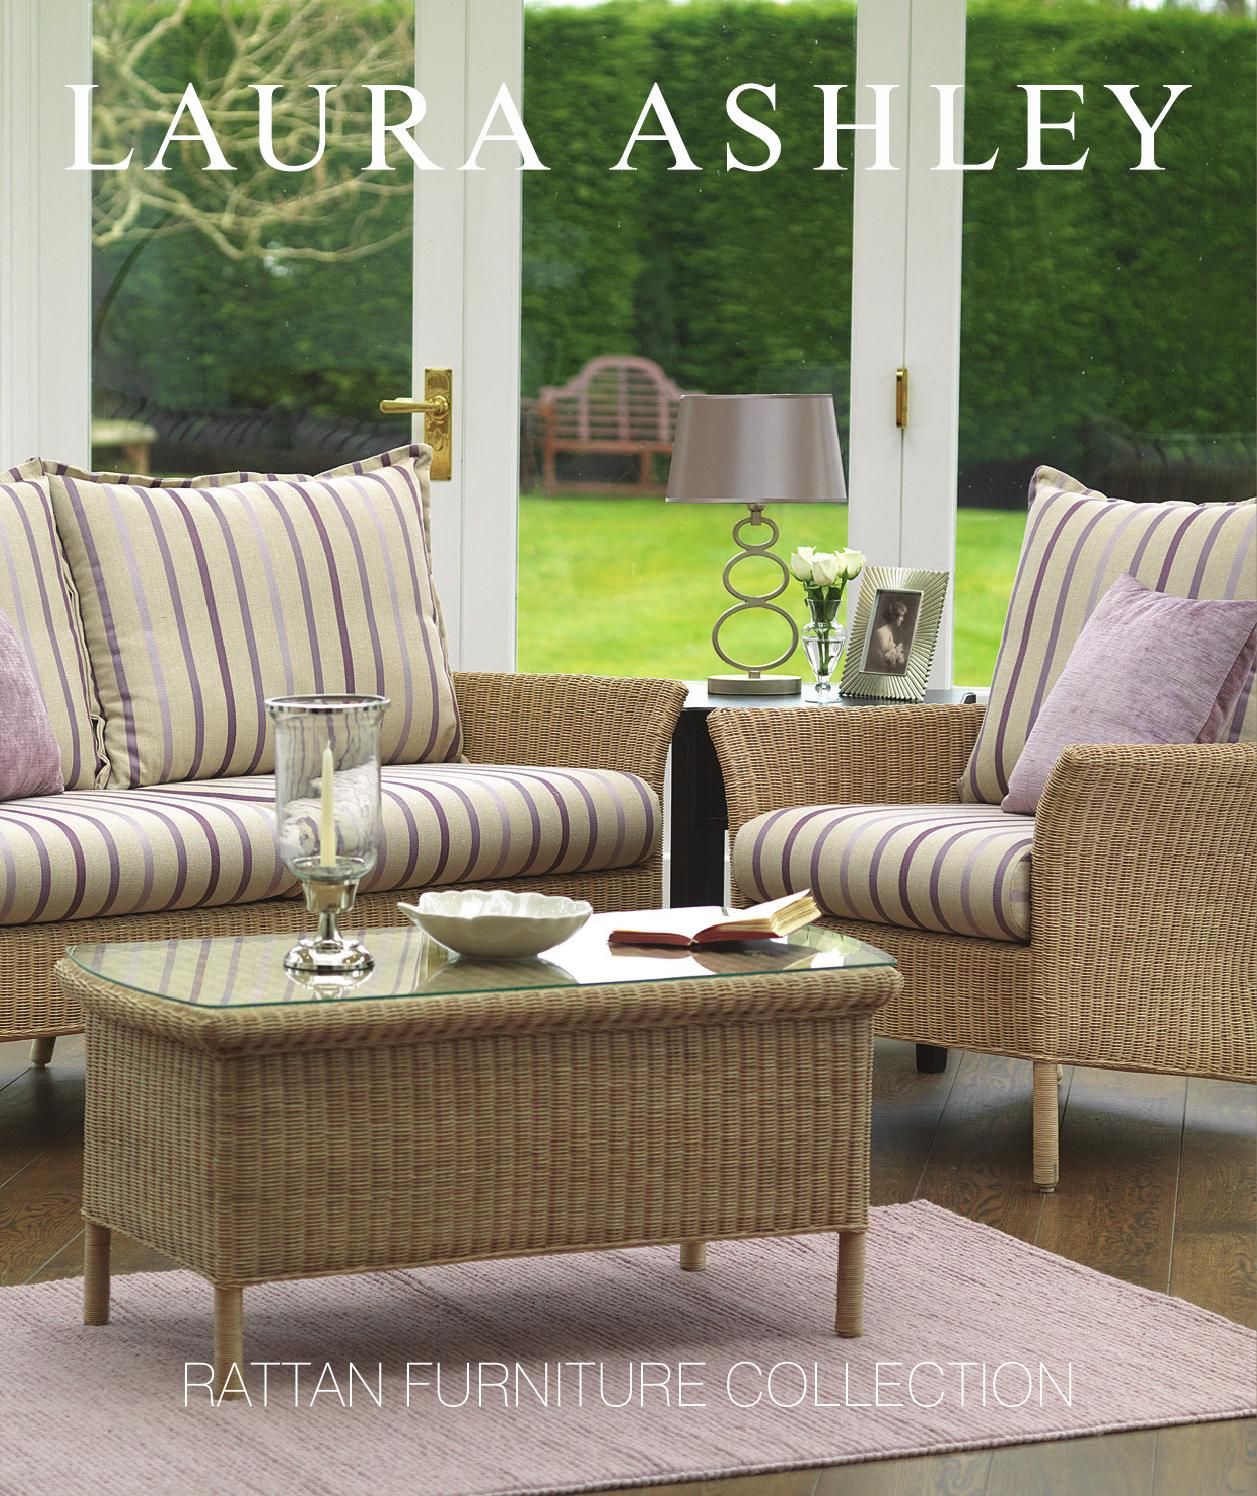 Laura Ashley Rattan Furniture By Daro (Trading) Ltd